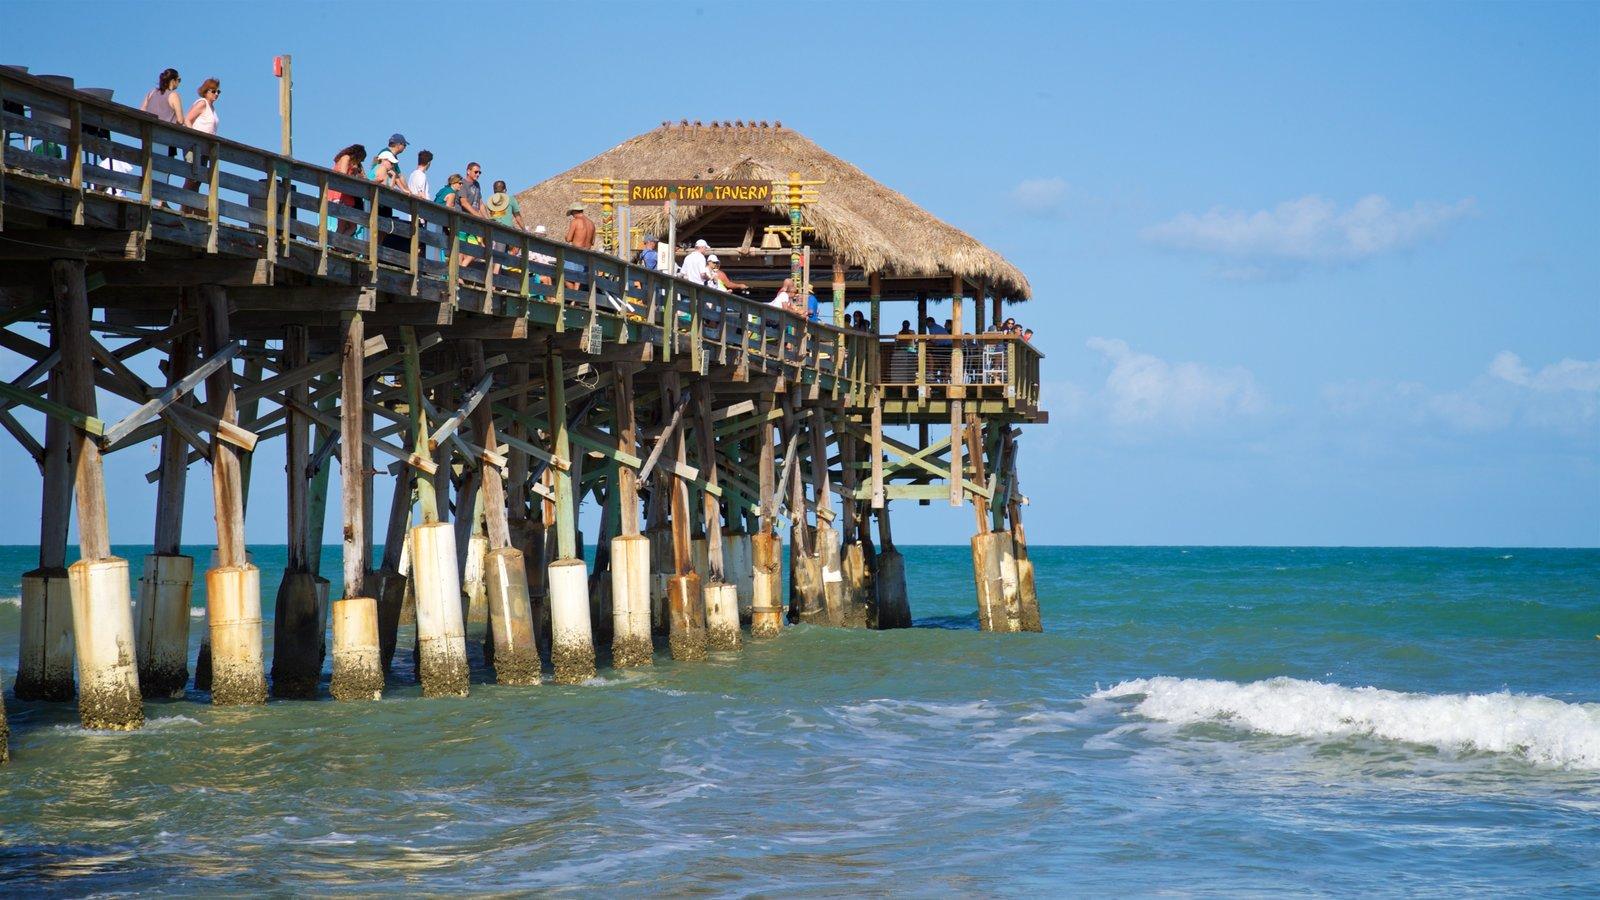 Cocoa Beach Pier which includes general coastal views